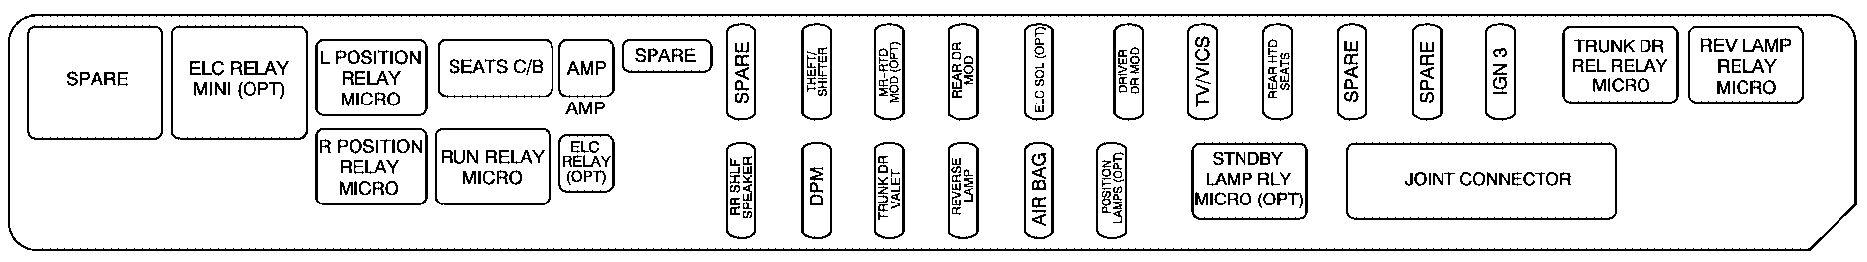 05 cadillac sts fuse box - wiring data diagram - 2006 cadillac cts wiring  diagram download